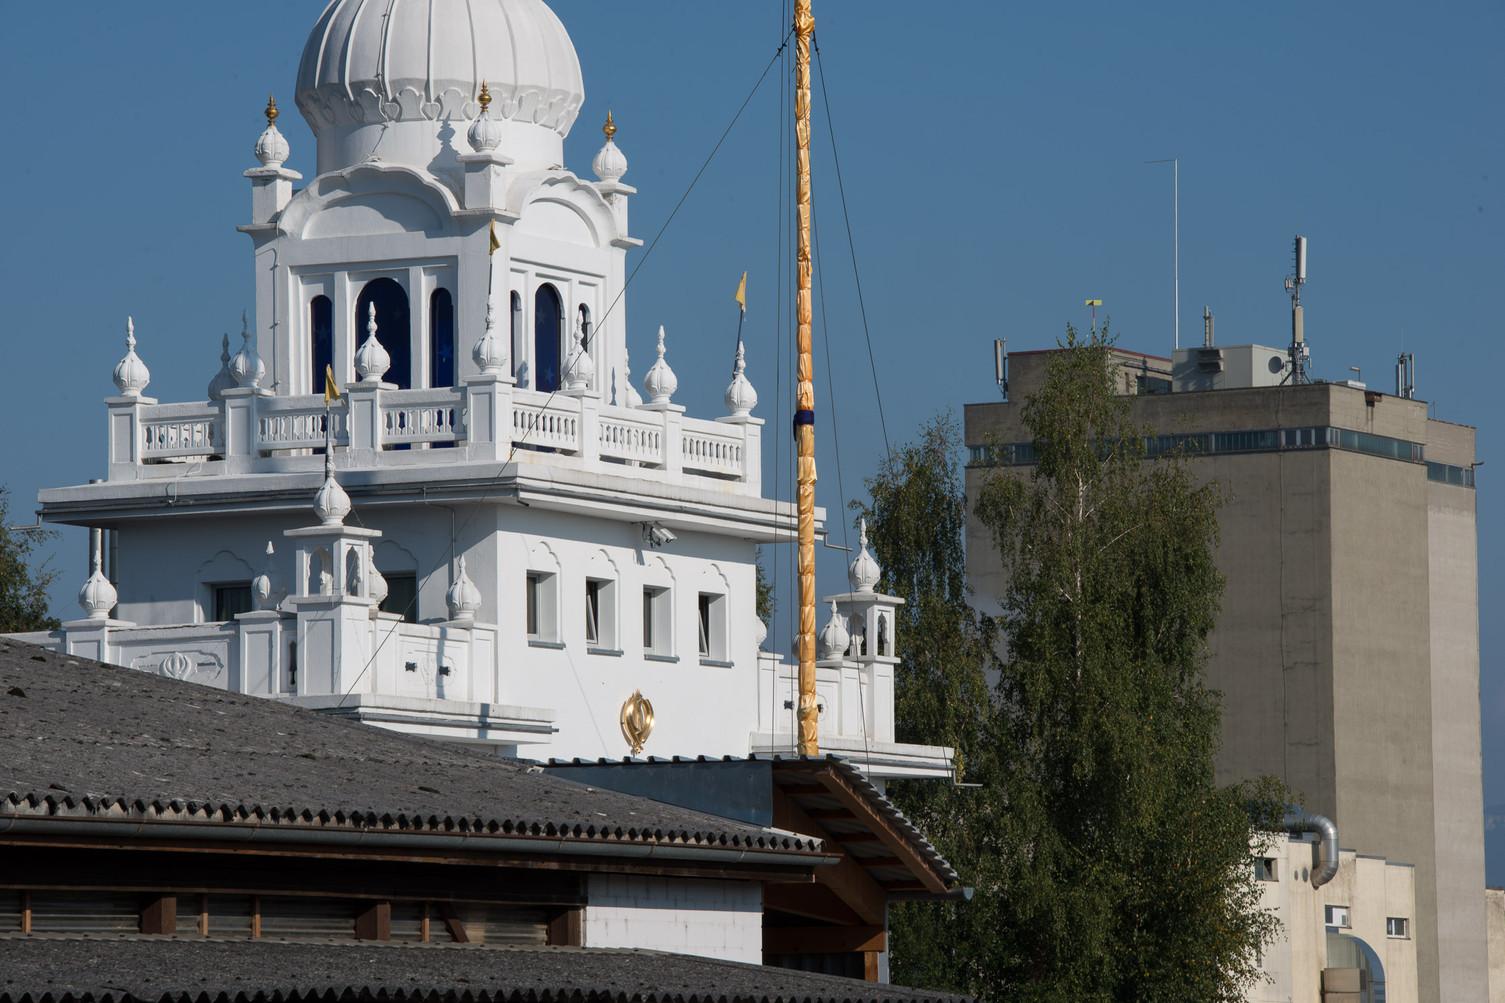 Sikh Tempel im Industriequartier Langenthal